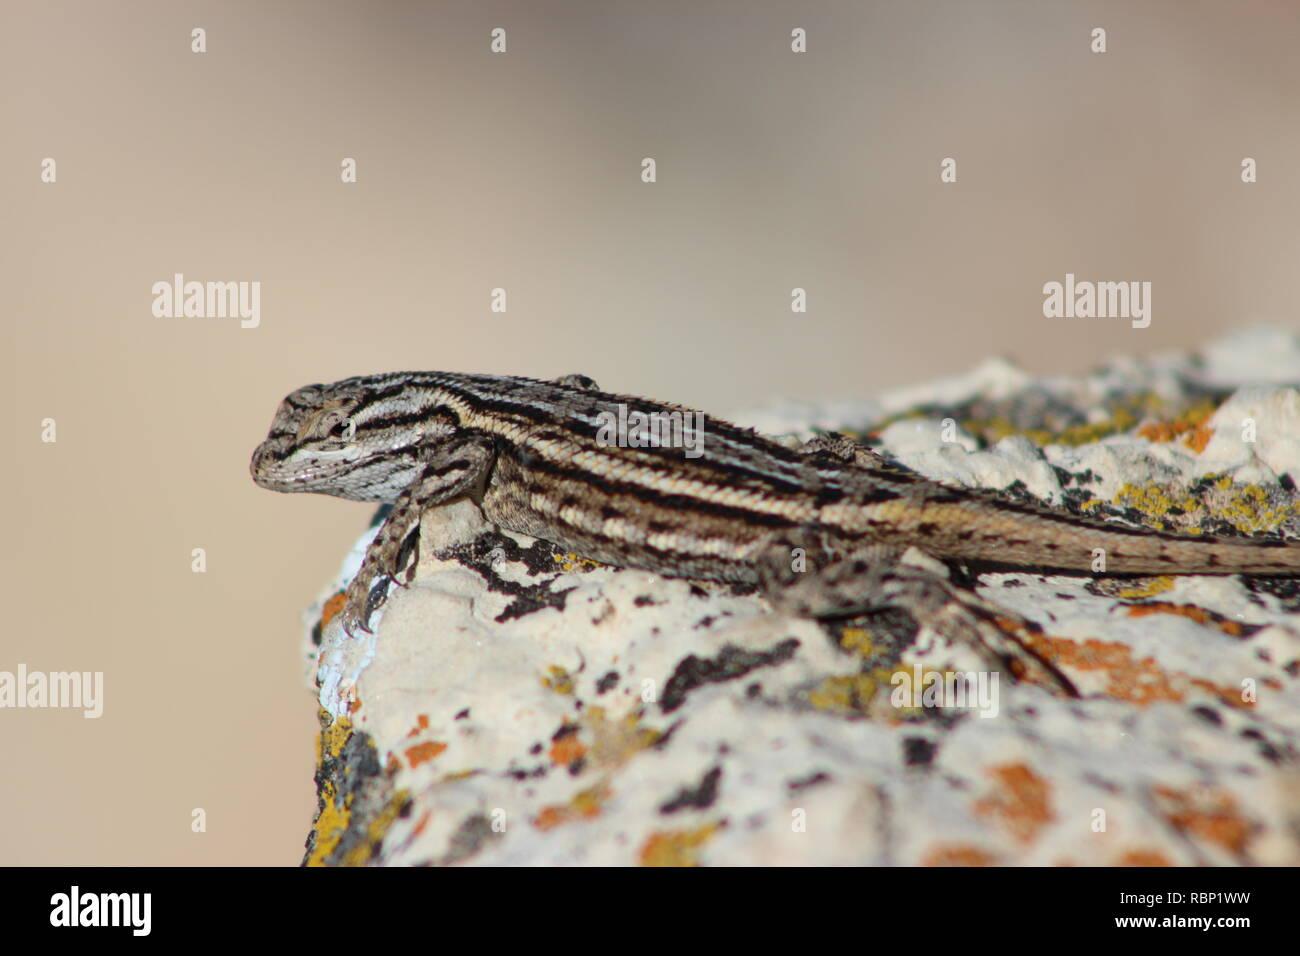 Plateau lizard at the Grand Canyon National Park, Arizona Stock Photo